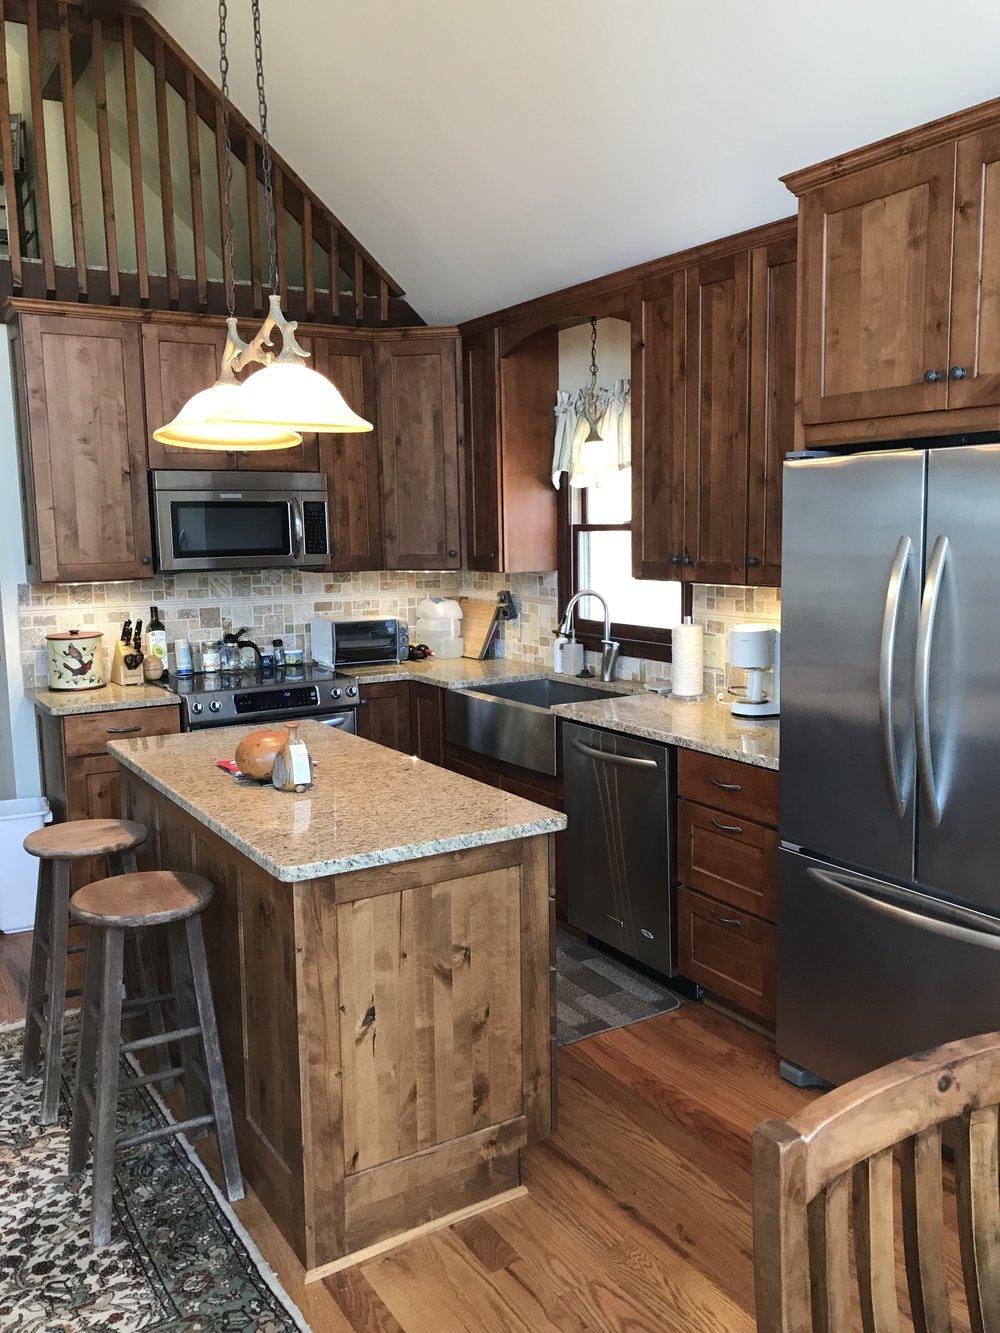 Brand New Kitchen Cabinets, Granite Countertops, SS Kitchen-Aid Appliances 13.JPG